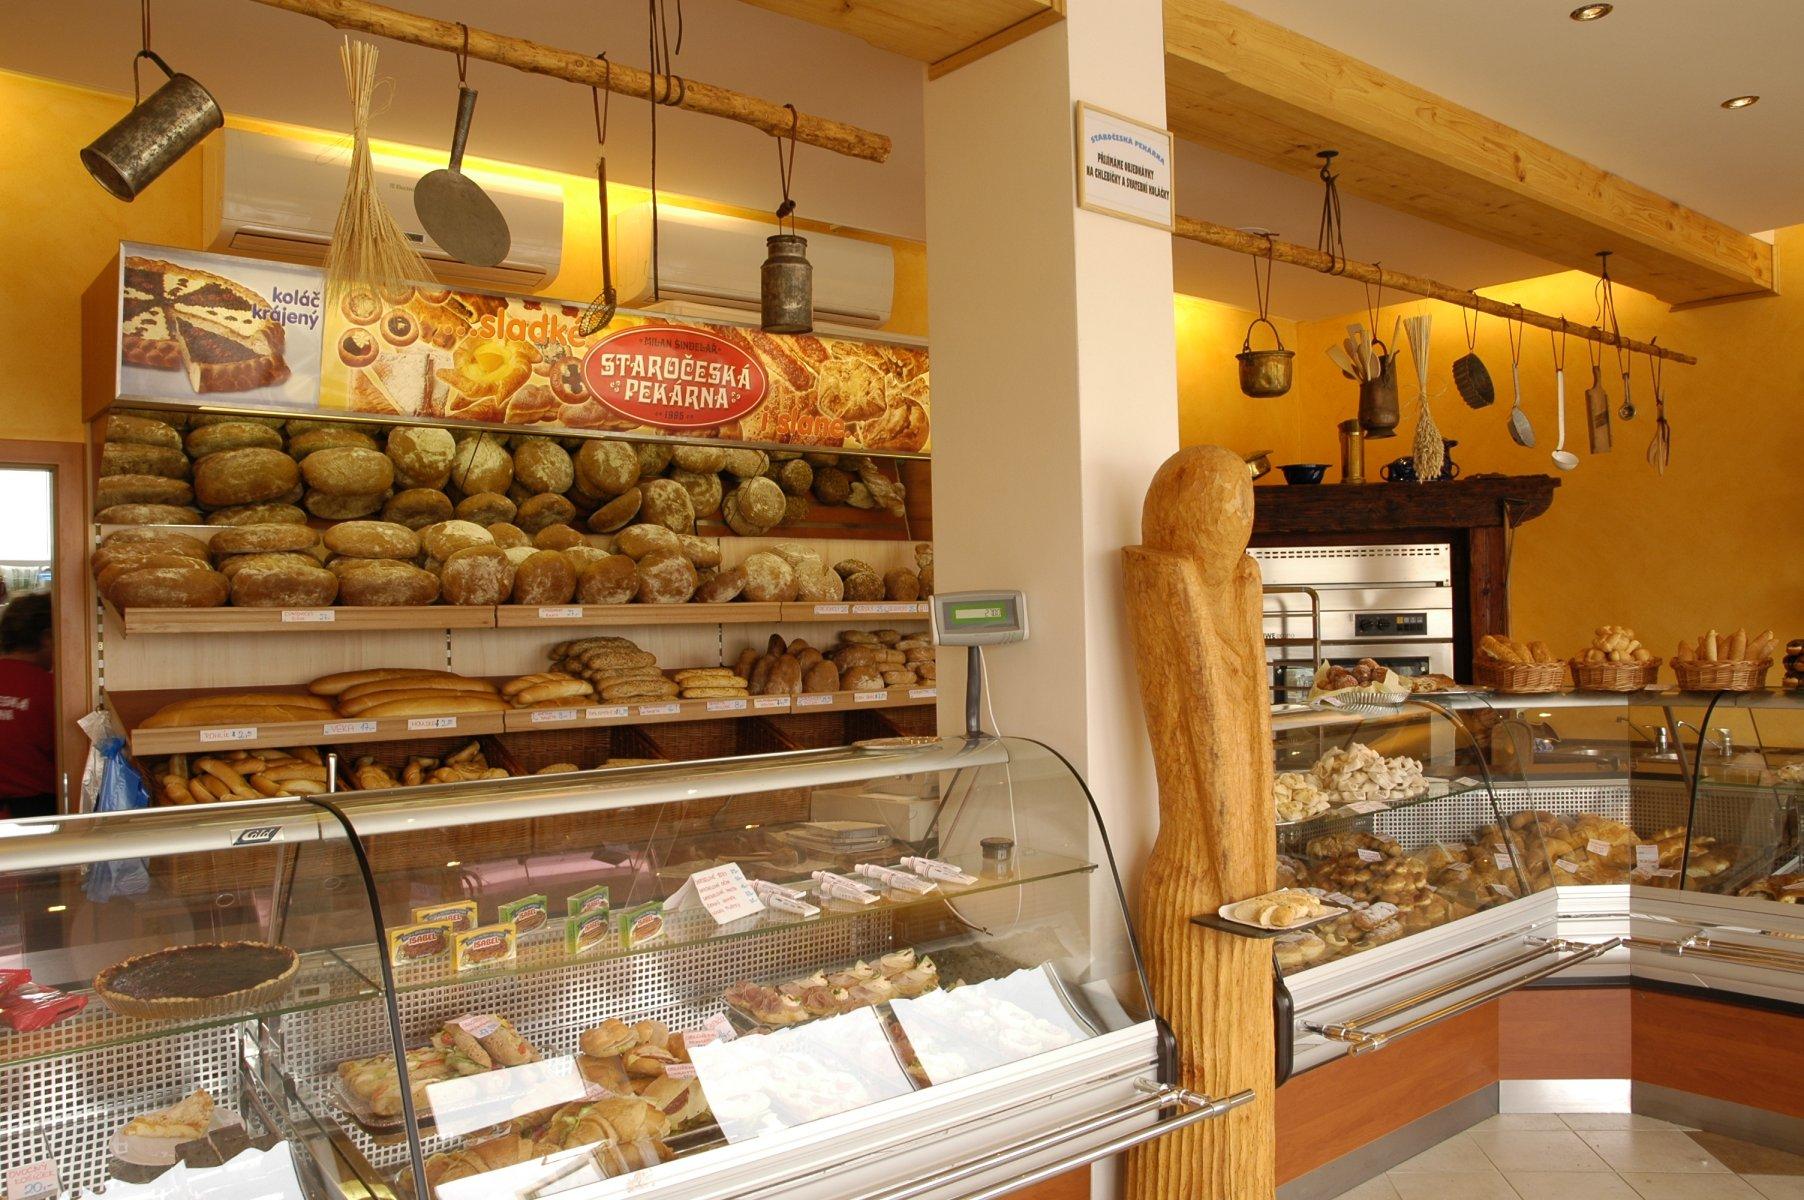 Staročeská pekárna